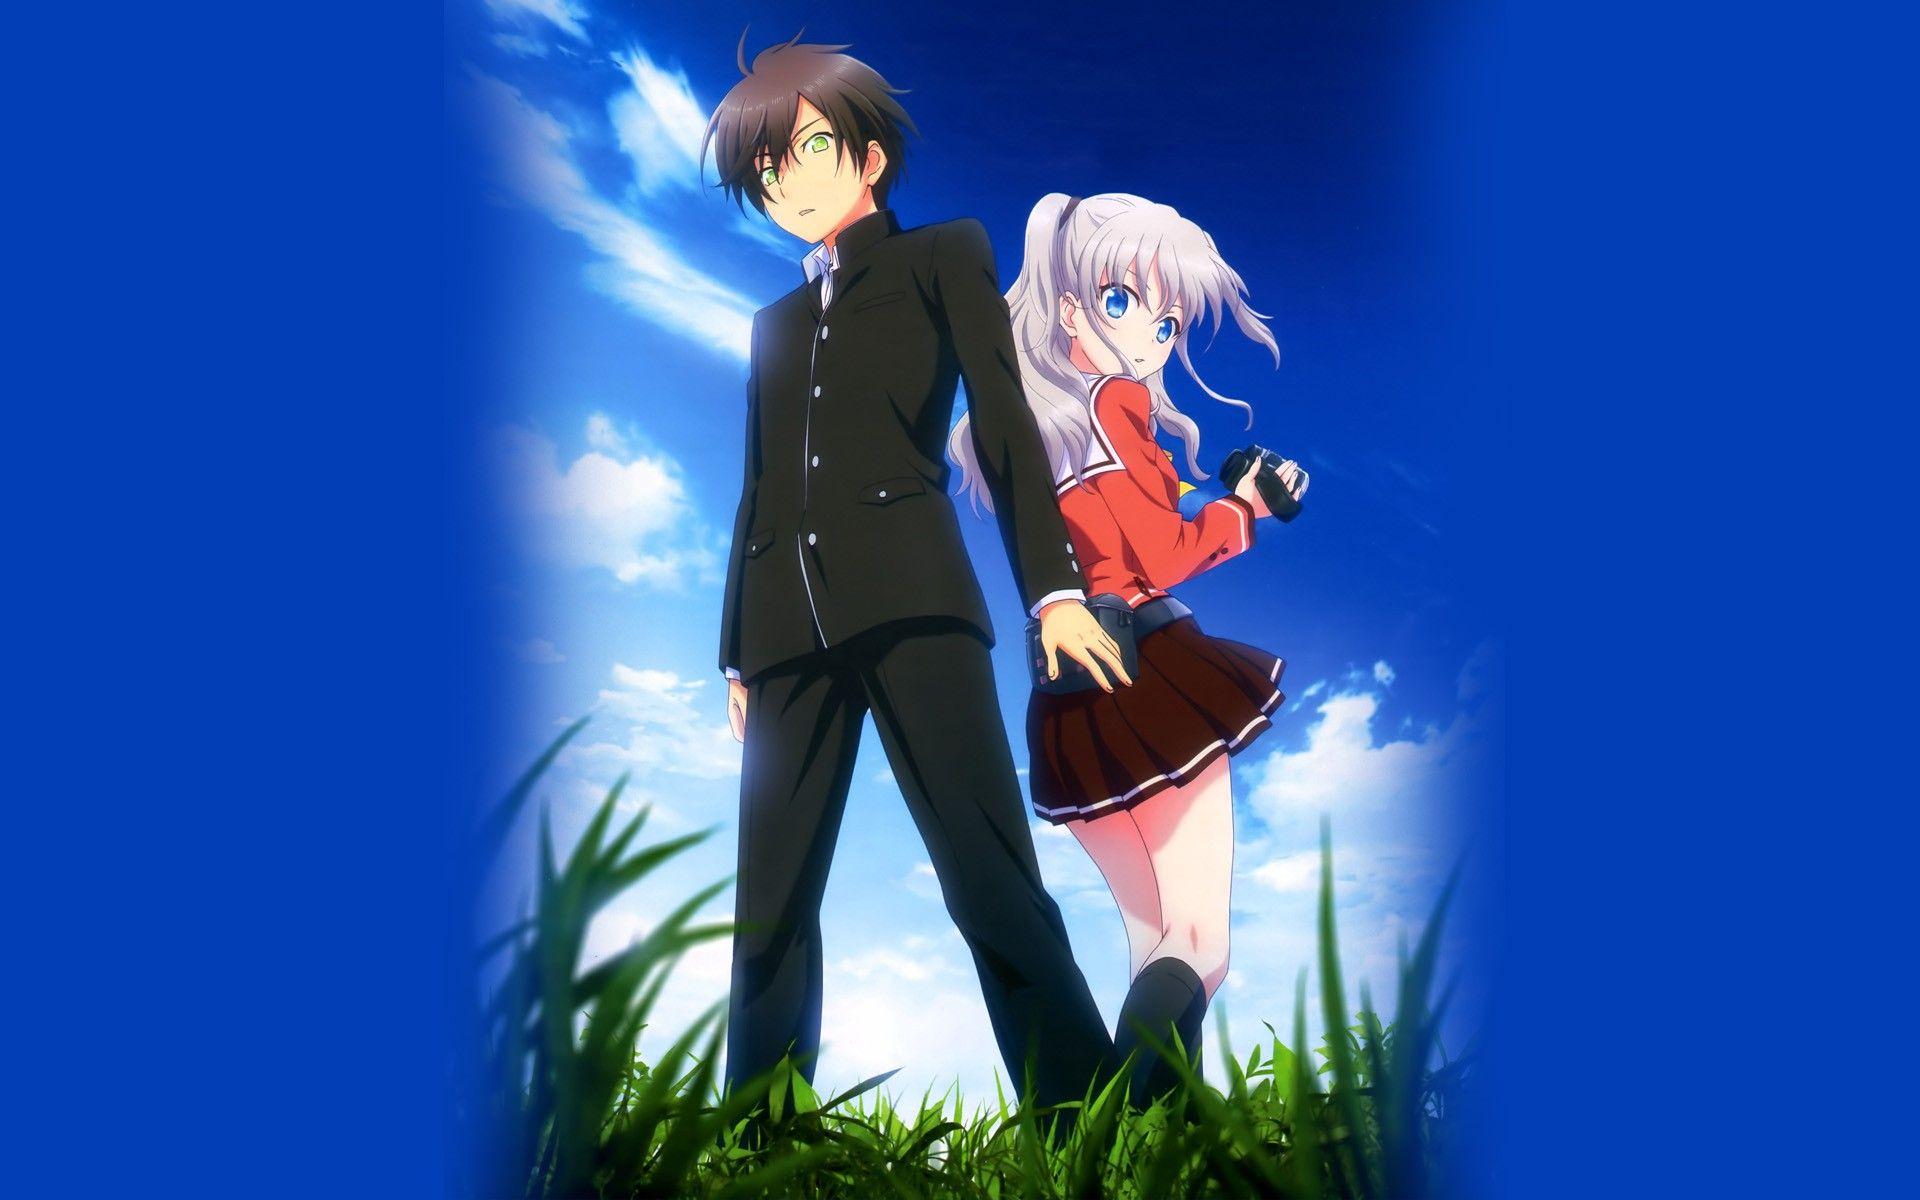 romantic anime couple anime paradise wallpaper 1920×1080 anime